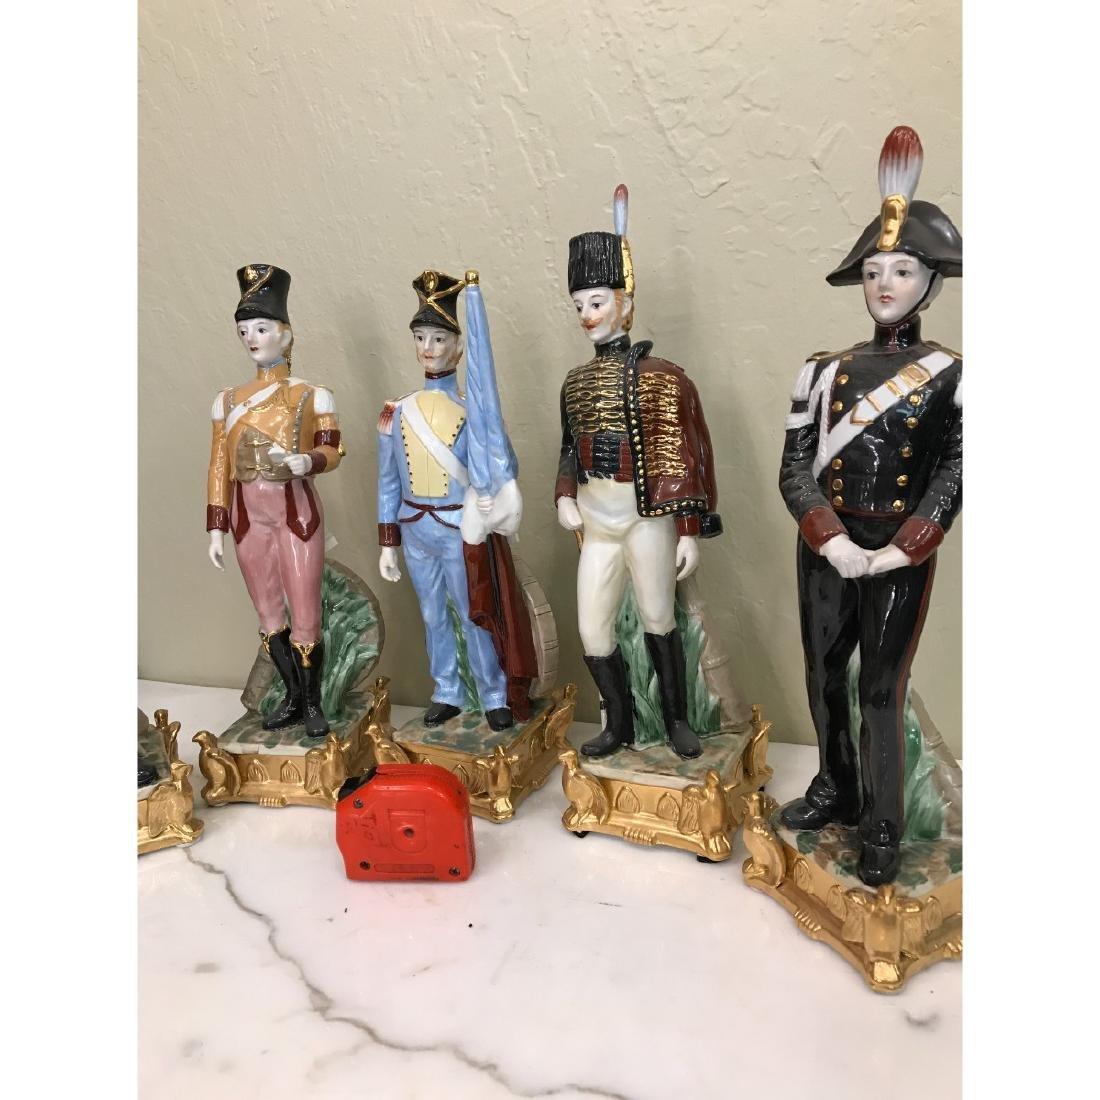 Set of 5 Porcelain Soldier Statues - 5